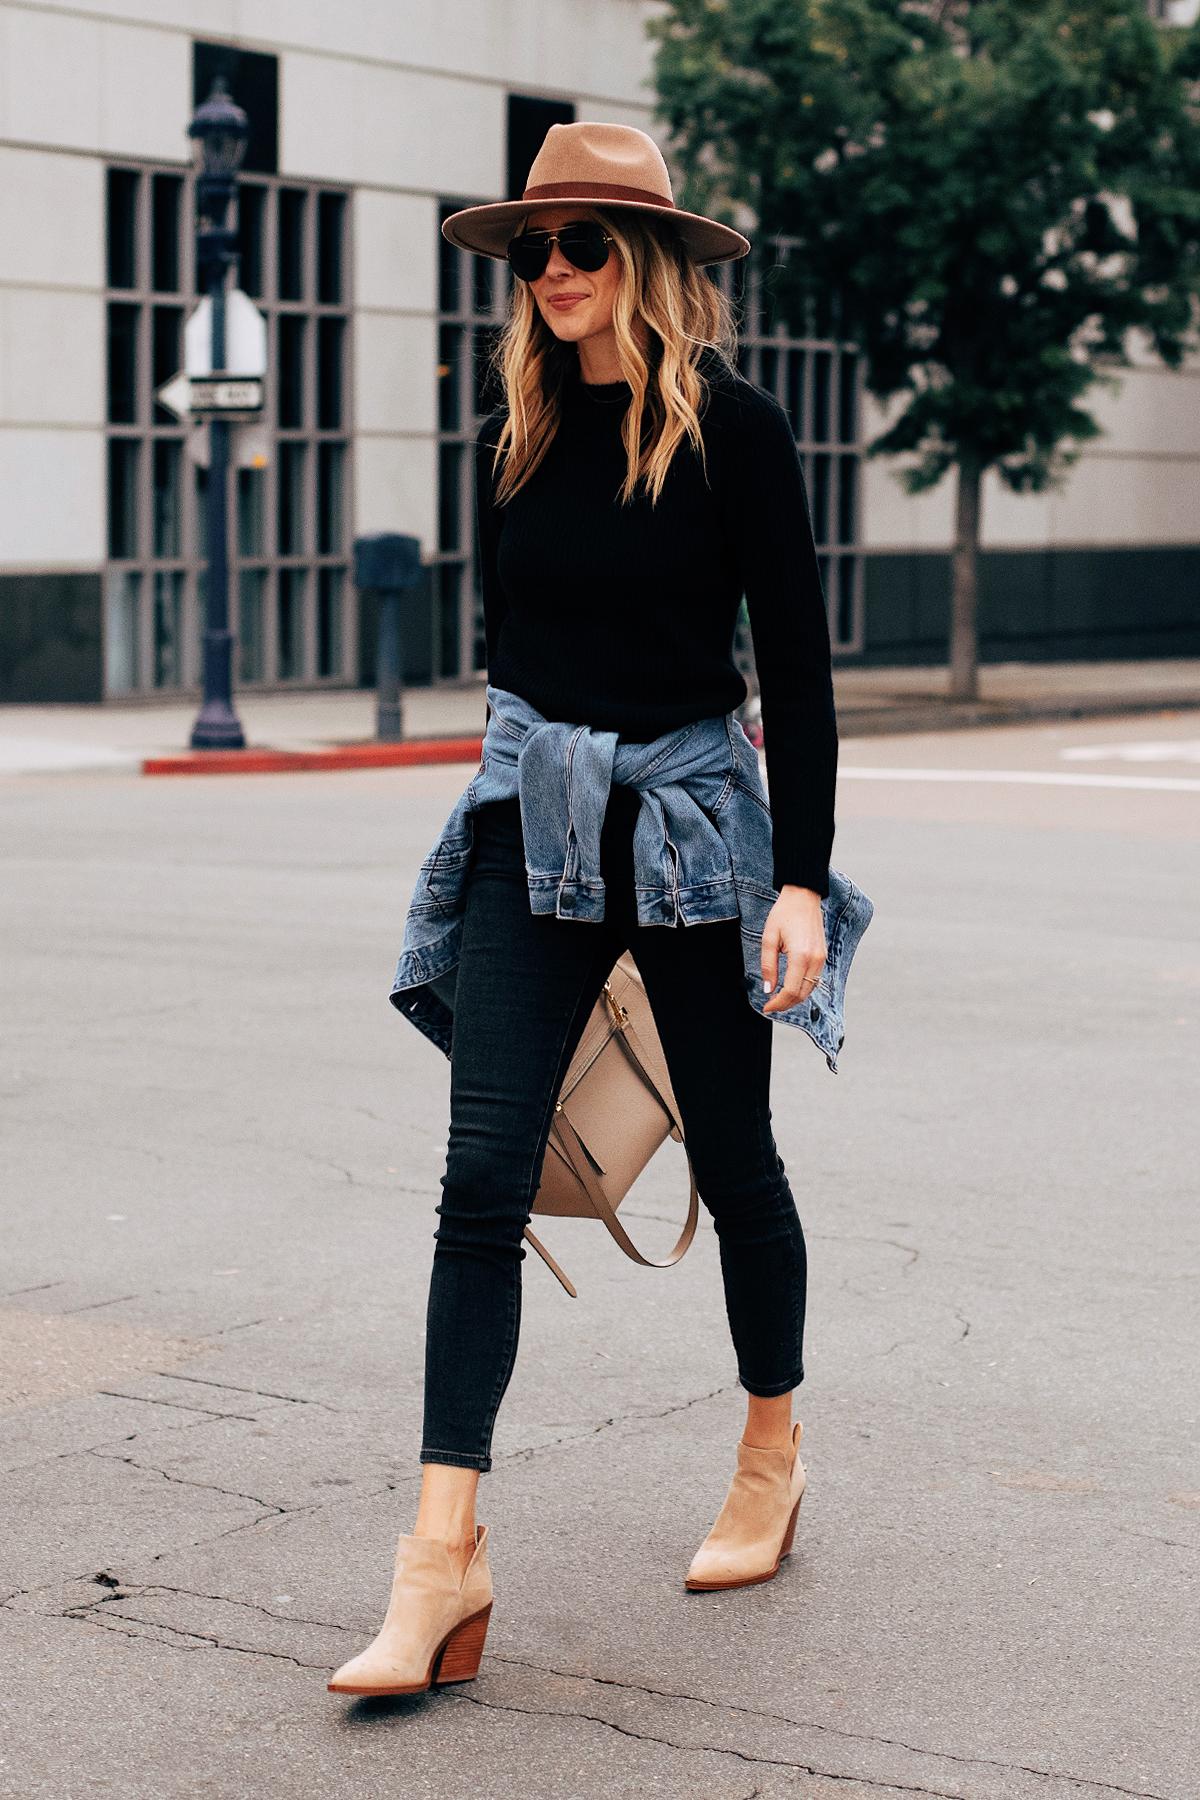 Fashion Jackson Wearing Black Sweater Black Skinny Jeans Denim Jacket Tan Booties Tan Wide Brim Hat